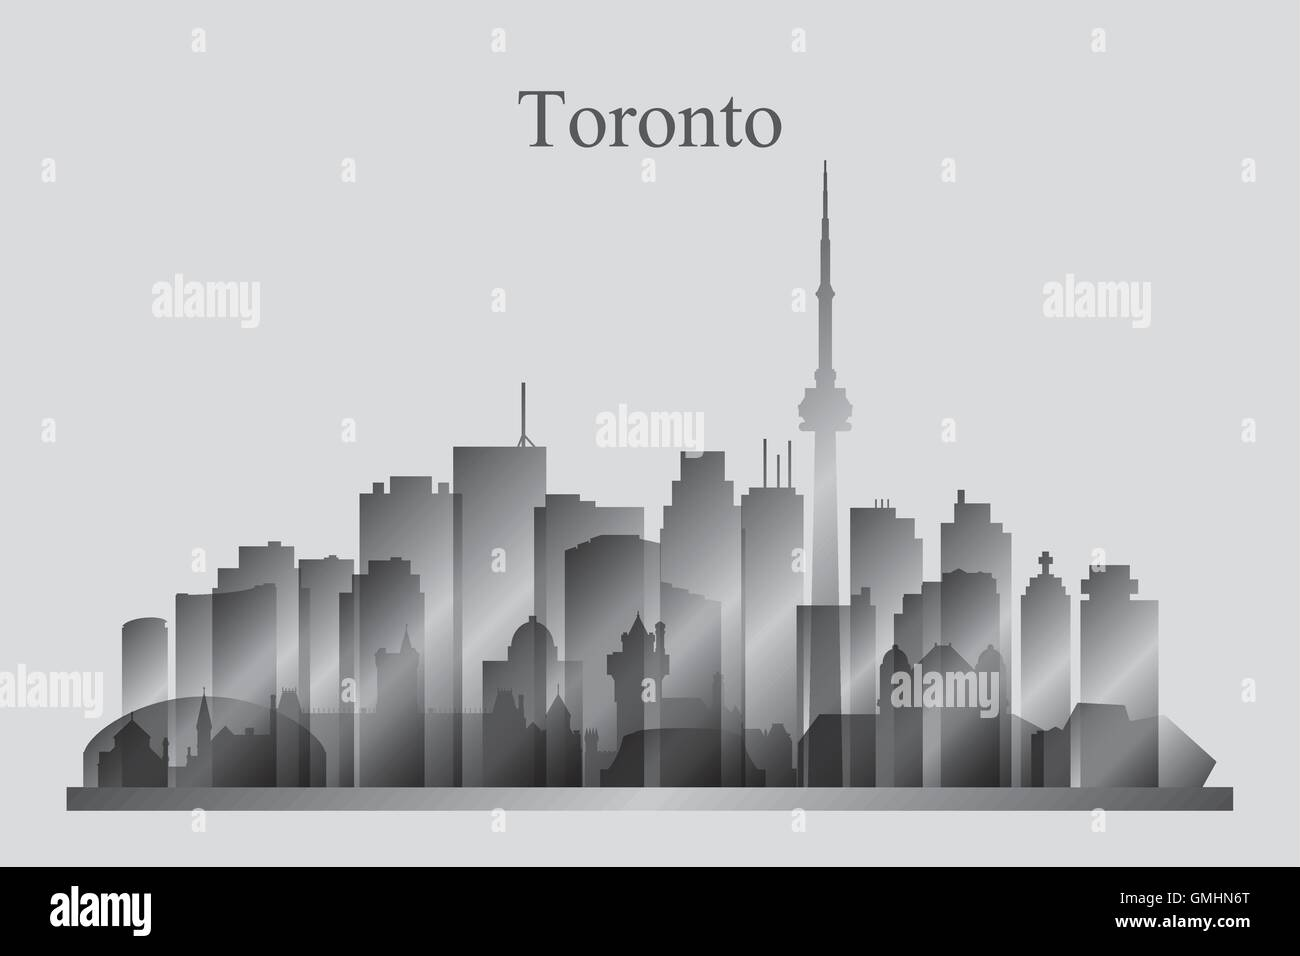 Toronto city skyline silhouette in grayscale - Stock Vector